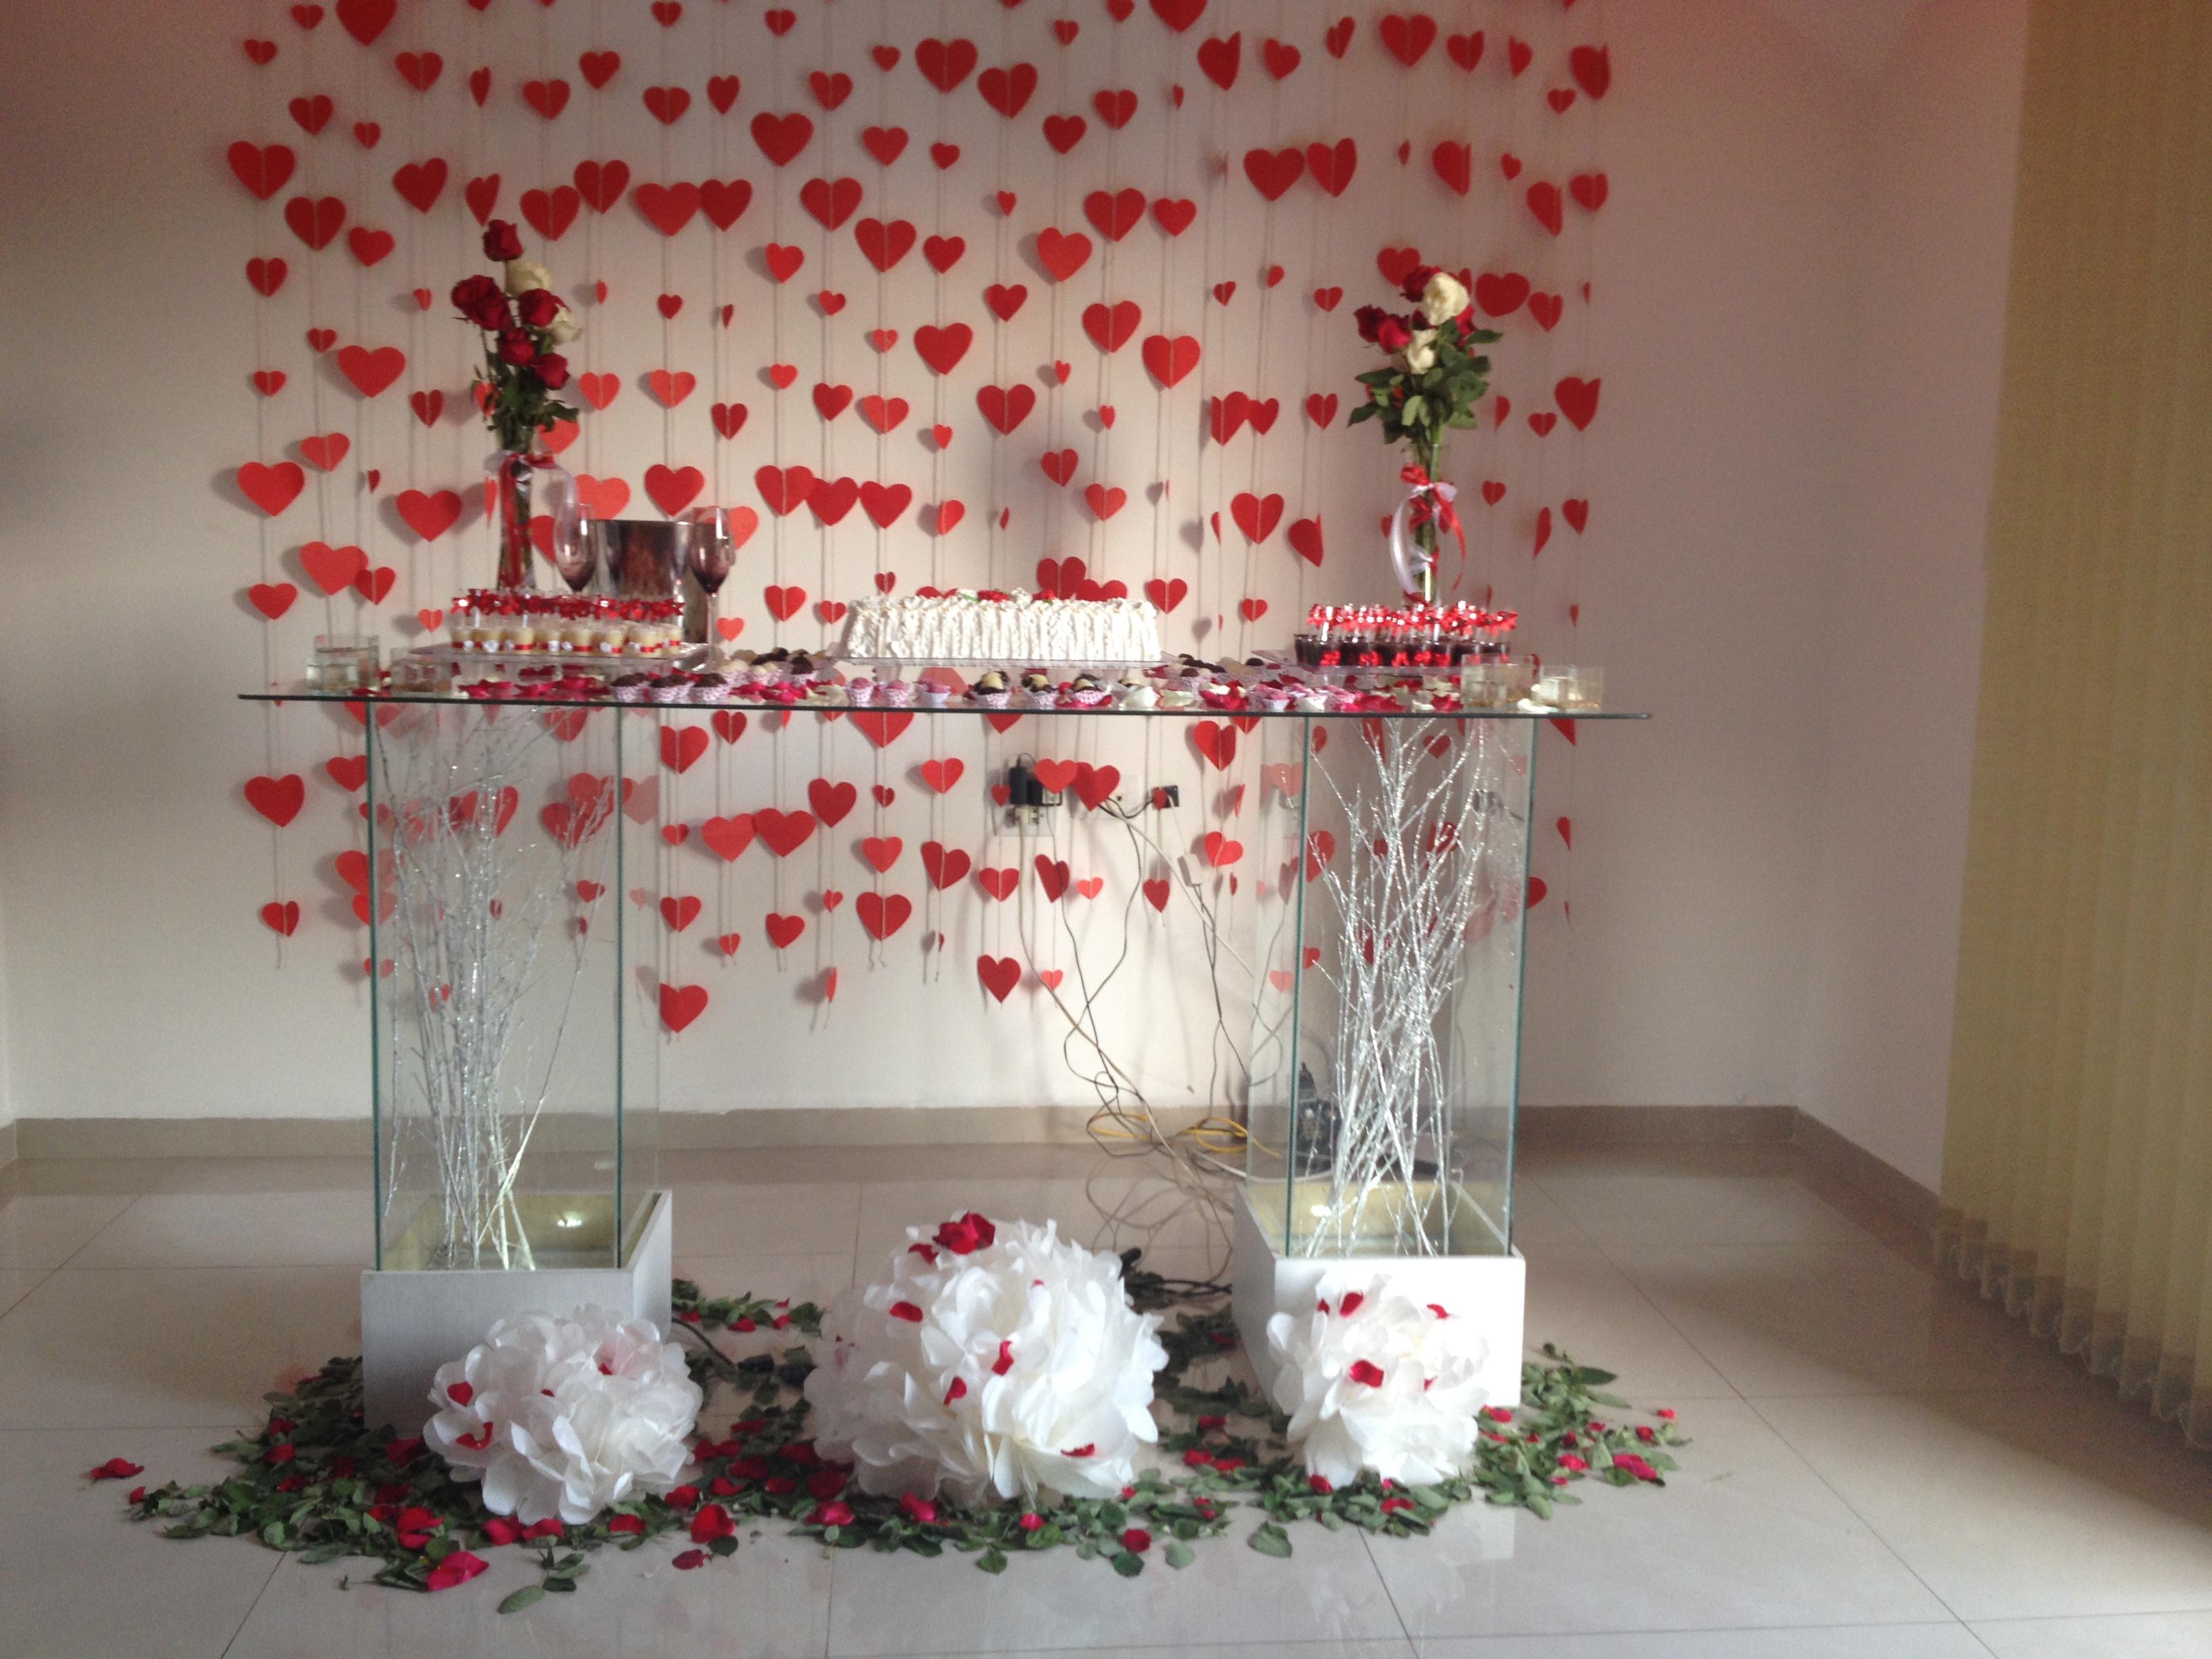 decoracao-completa-casamento-noivado-decoracao.jpg